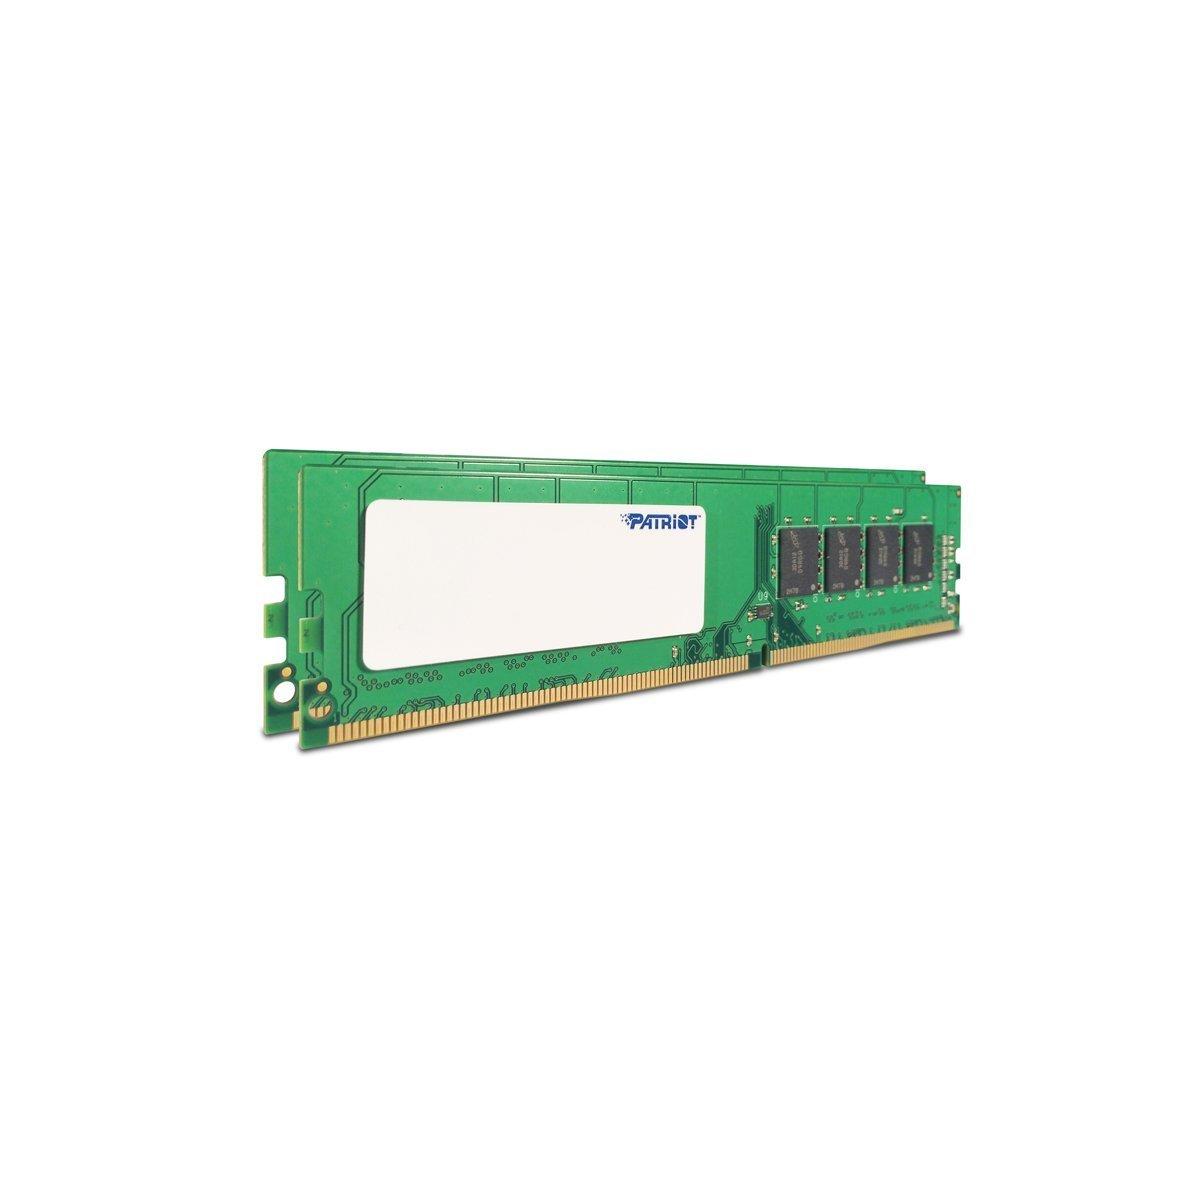 PatriotSignature Line 8GB (2 x 4GB) 288-Pin DDR4 PC4-19200 2400MHz Memory Module Kit PSD48G2400K by Patriot (Image #3)